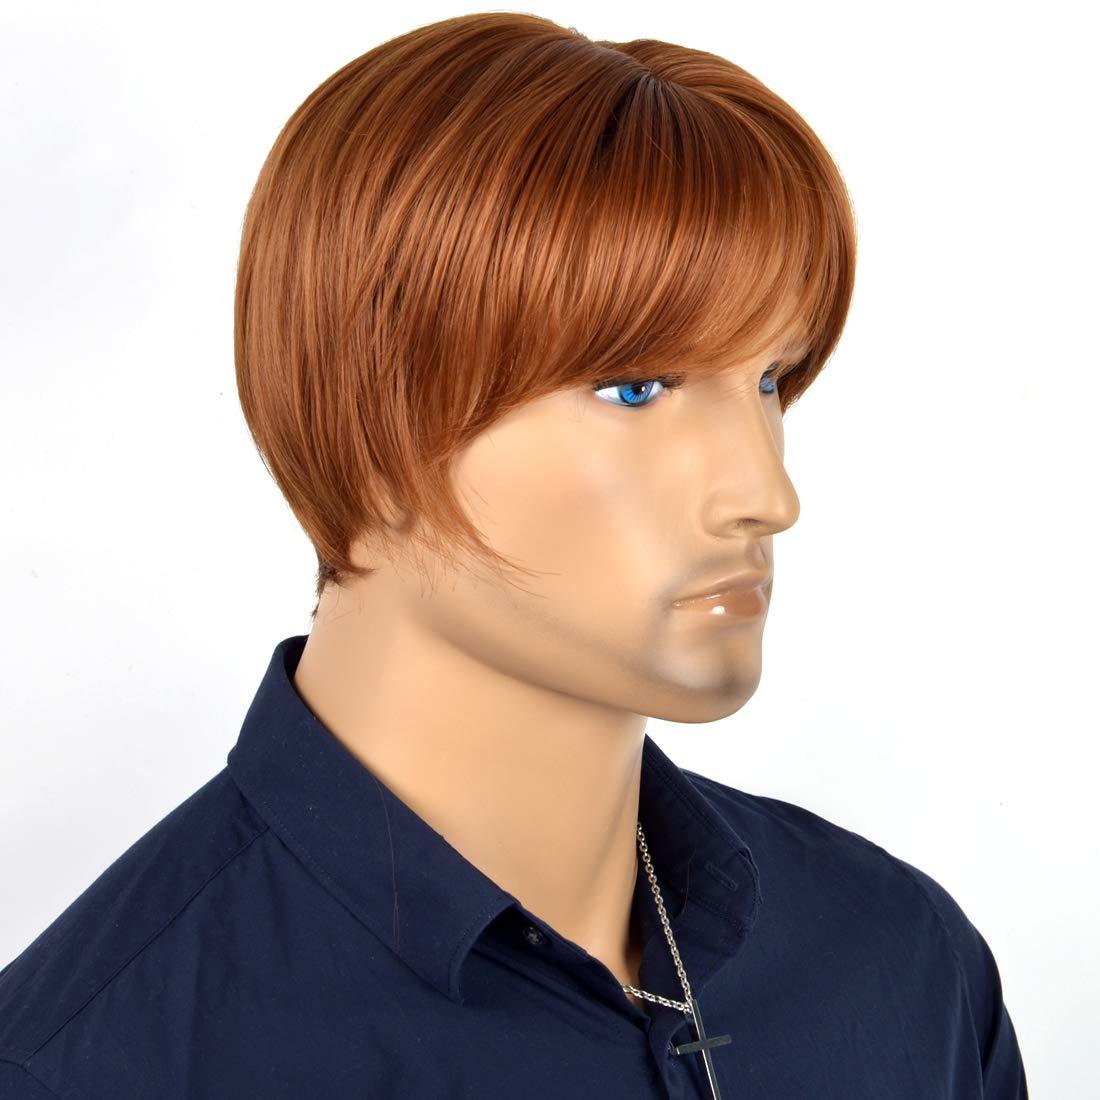 Amazon Com Niboka Men Wigs Dark Brown Cool Short Straight Medium Style Central Parting Light Brown Hair Heat Human Hair Beauty